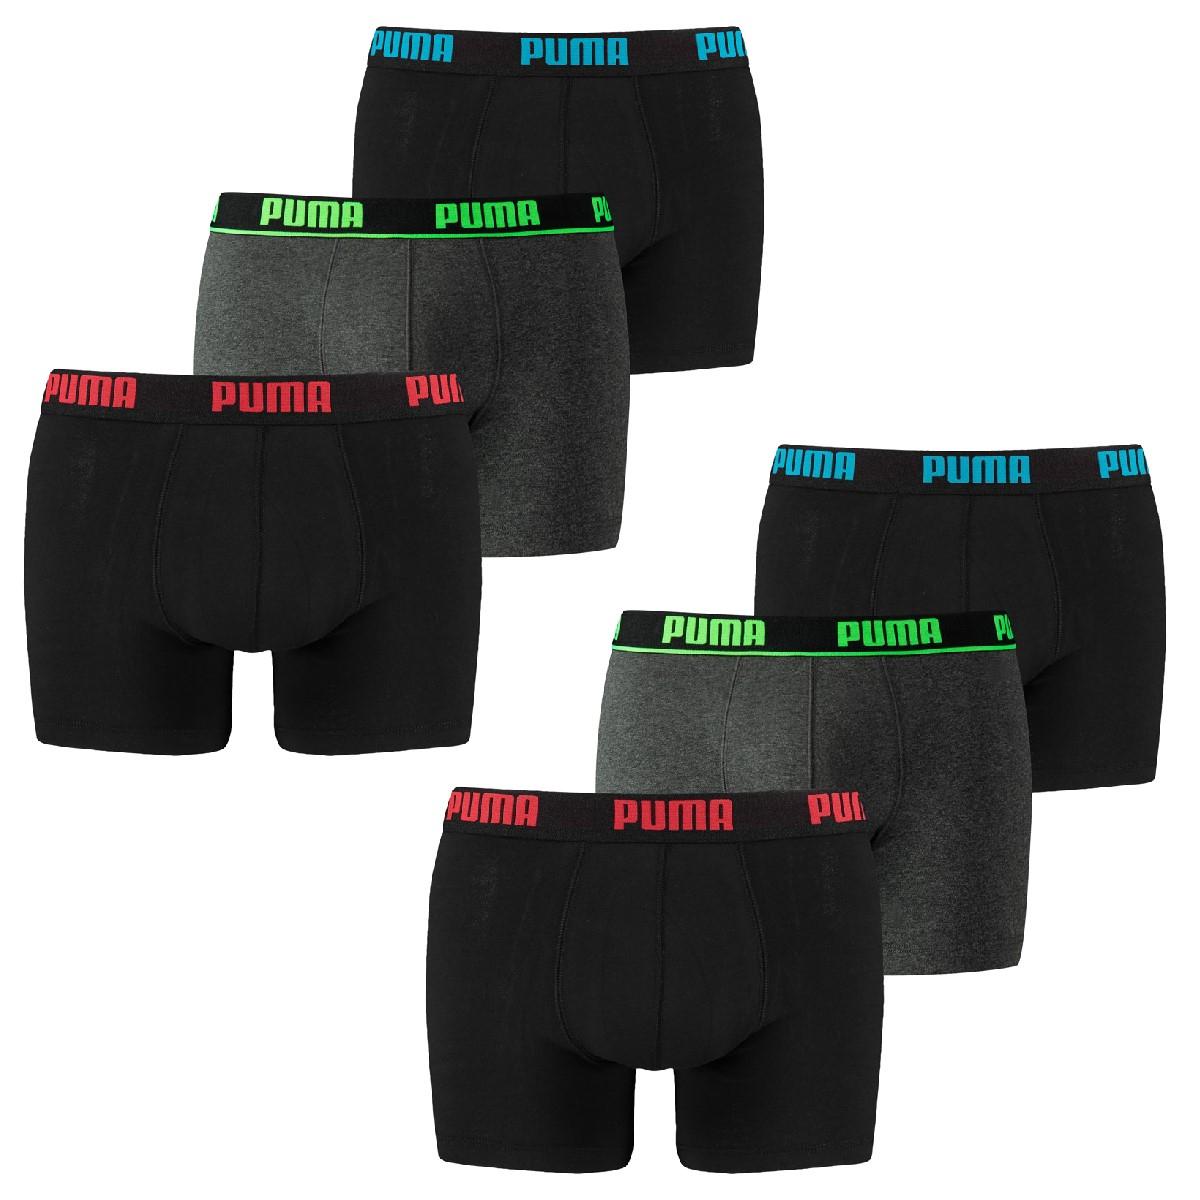 6er Pack Puma Boxer Boxershorts Unterwäsche Catbrand Promo